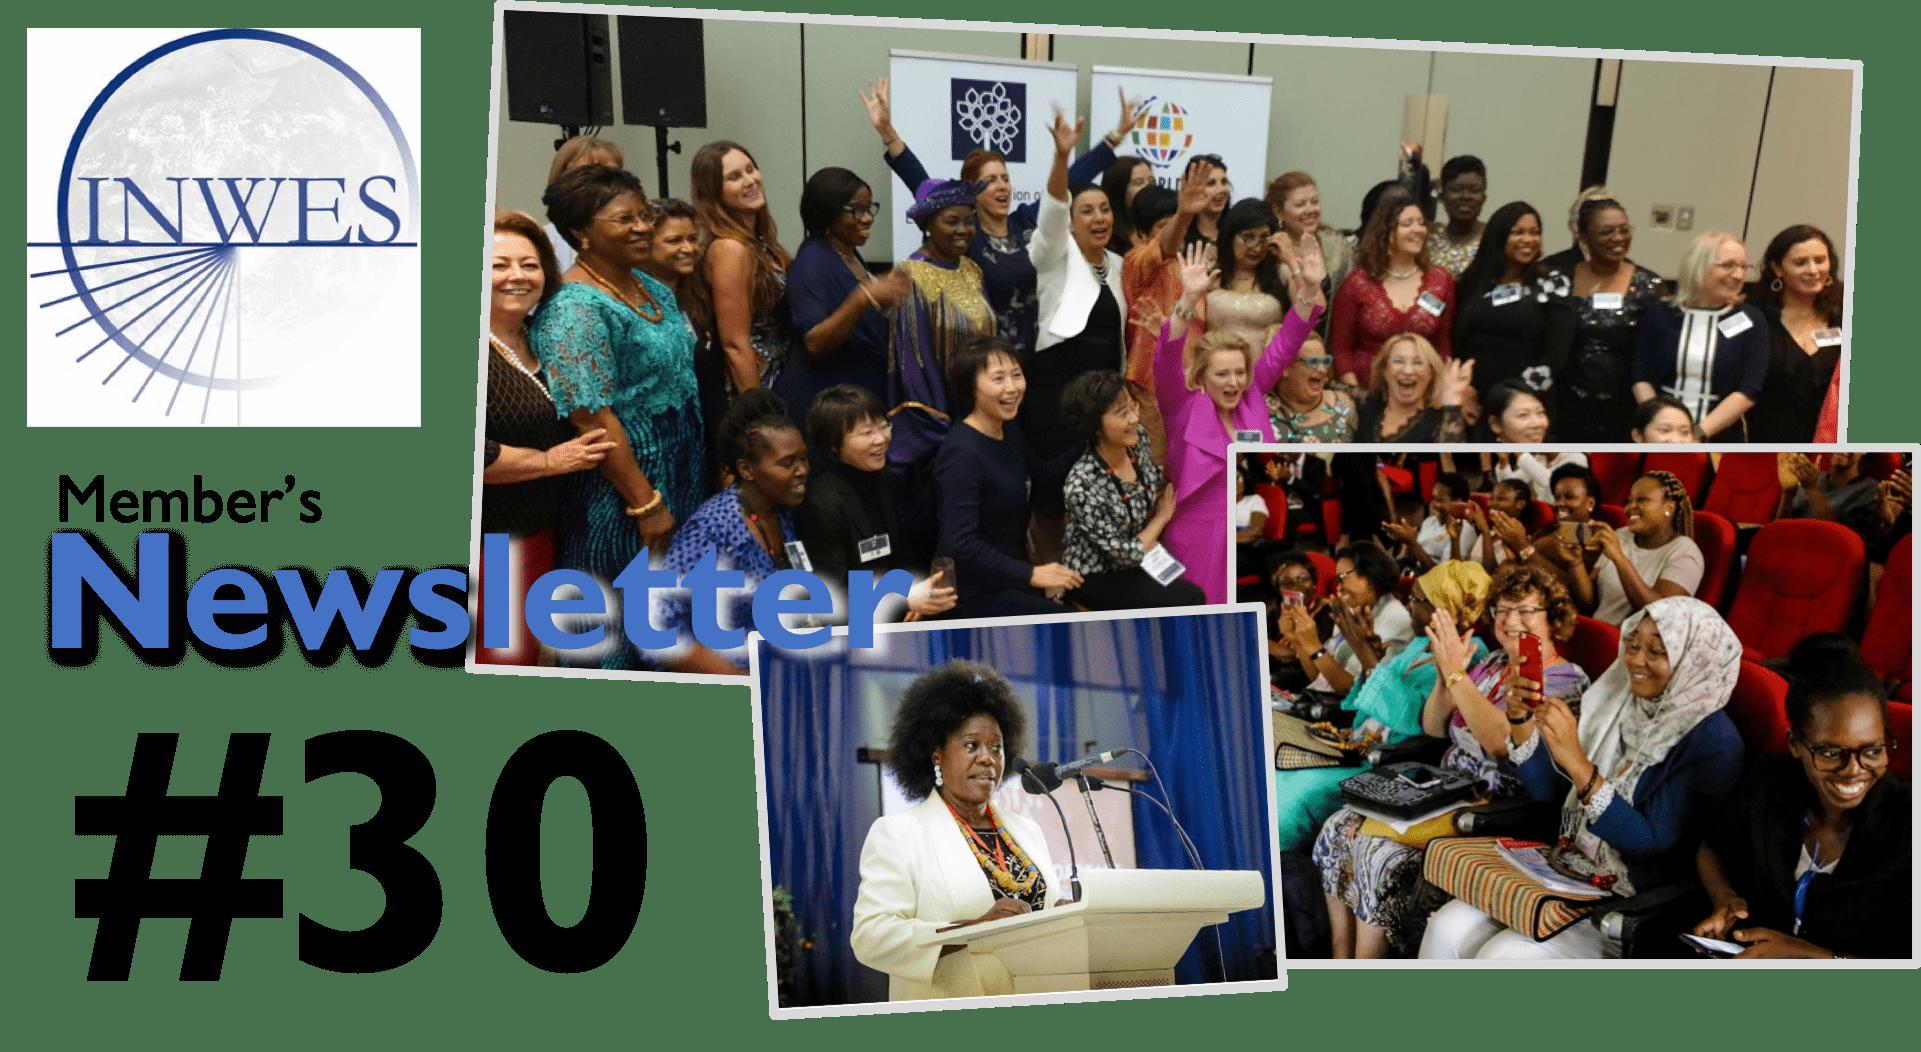 INWES Newsletter #30